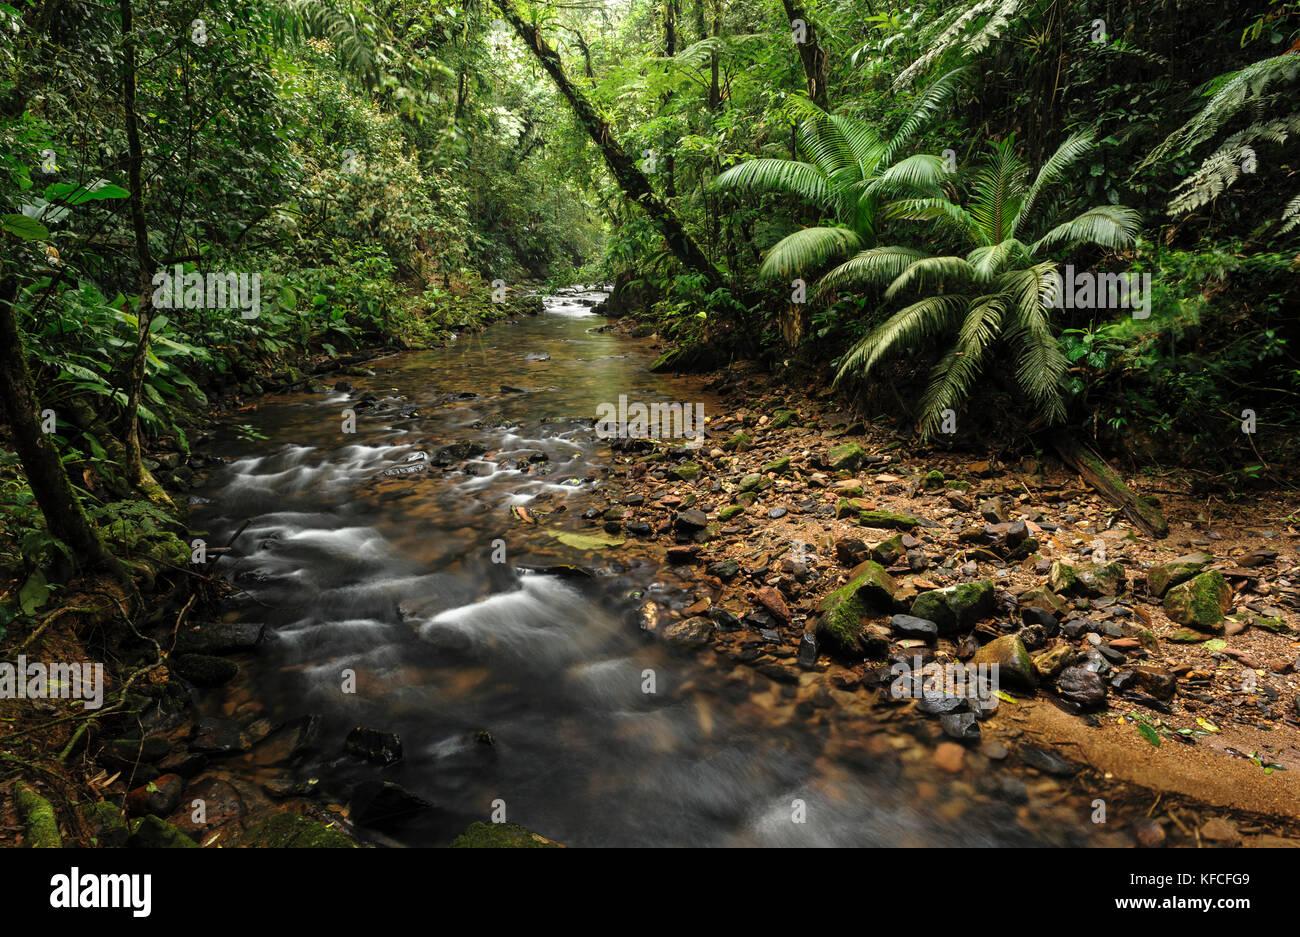 A mountain creek in the Atlantic Rainforest of SE Brazil - Stock Image